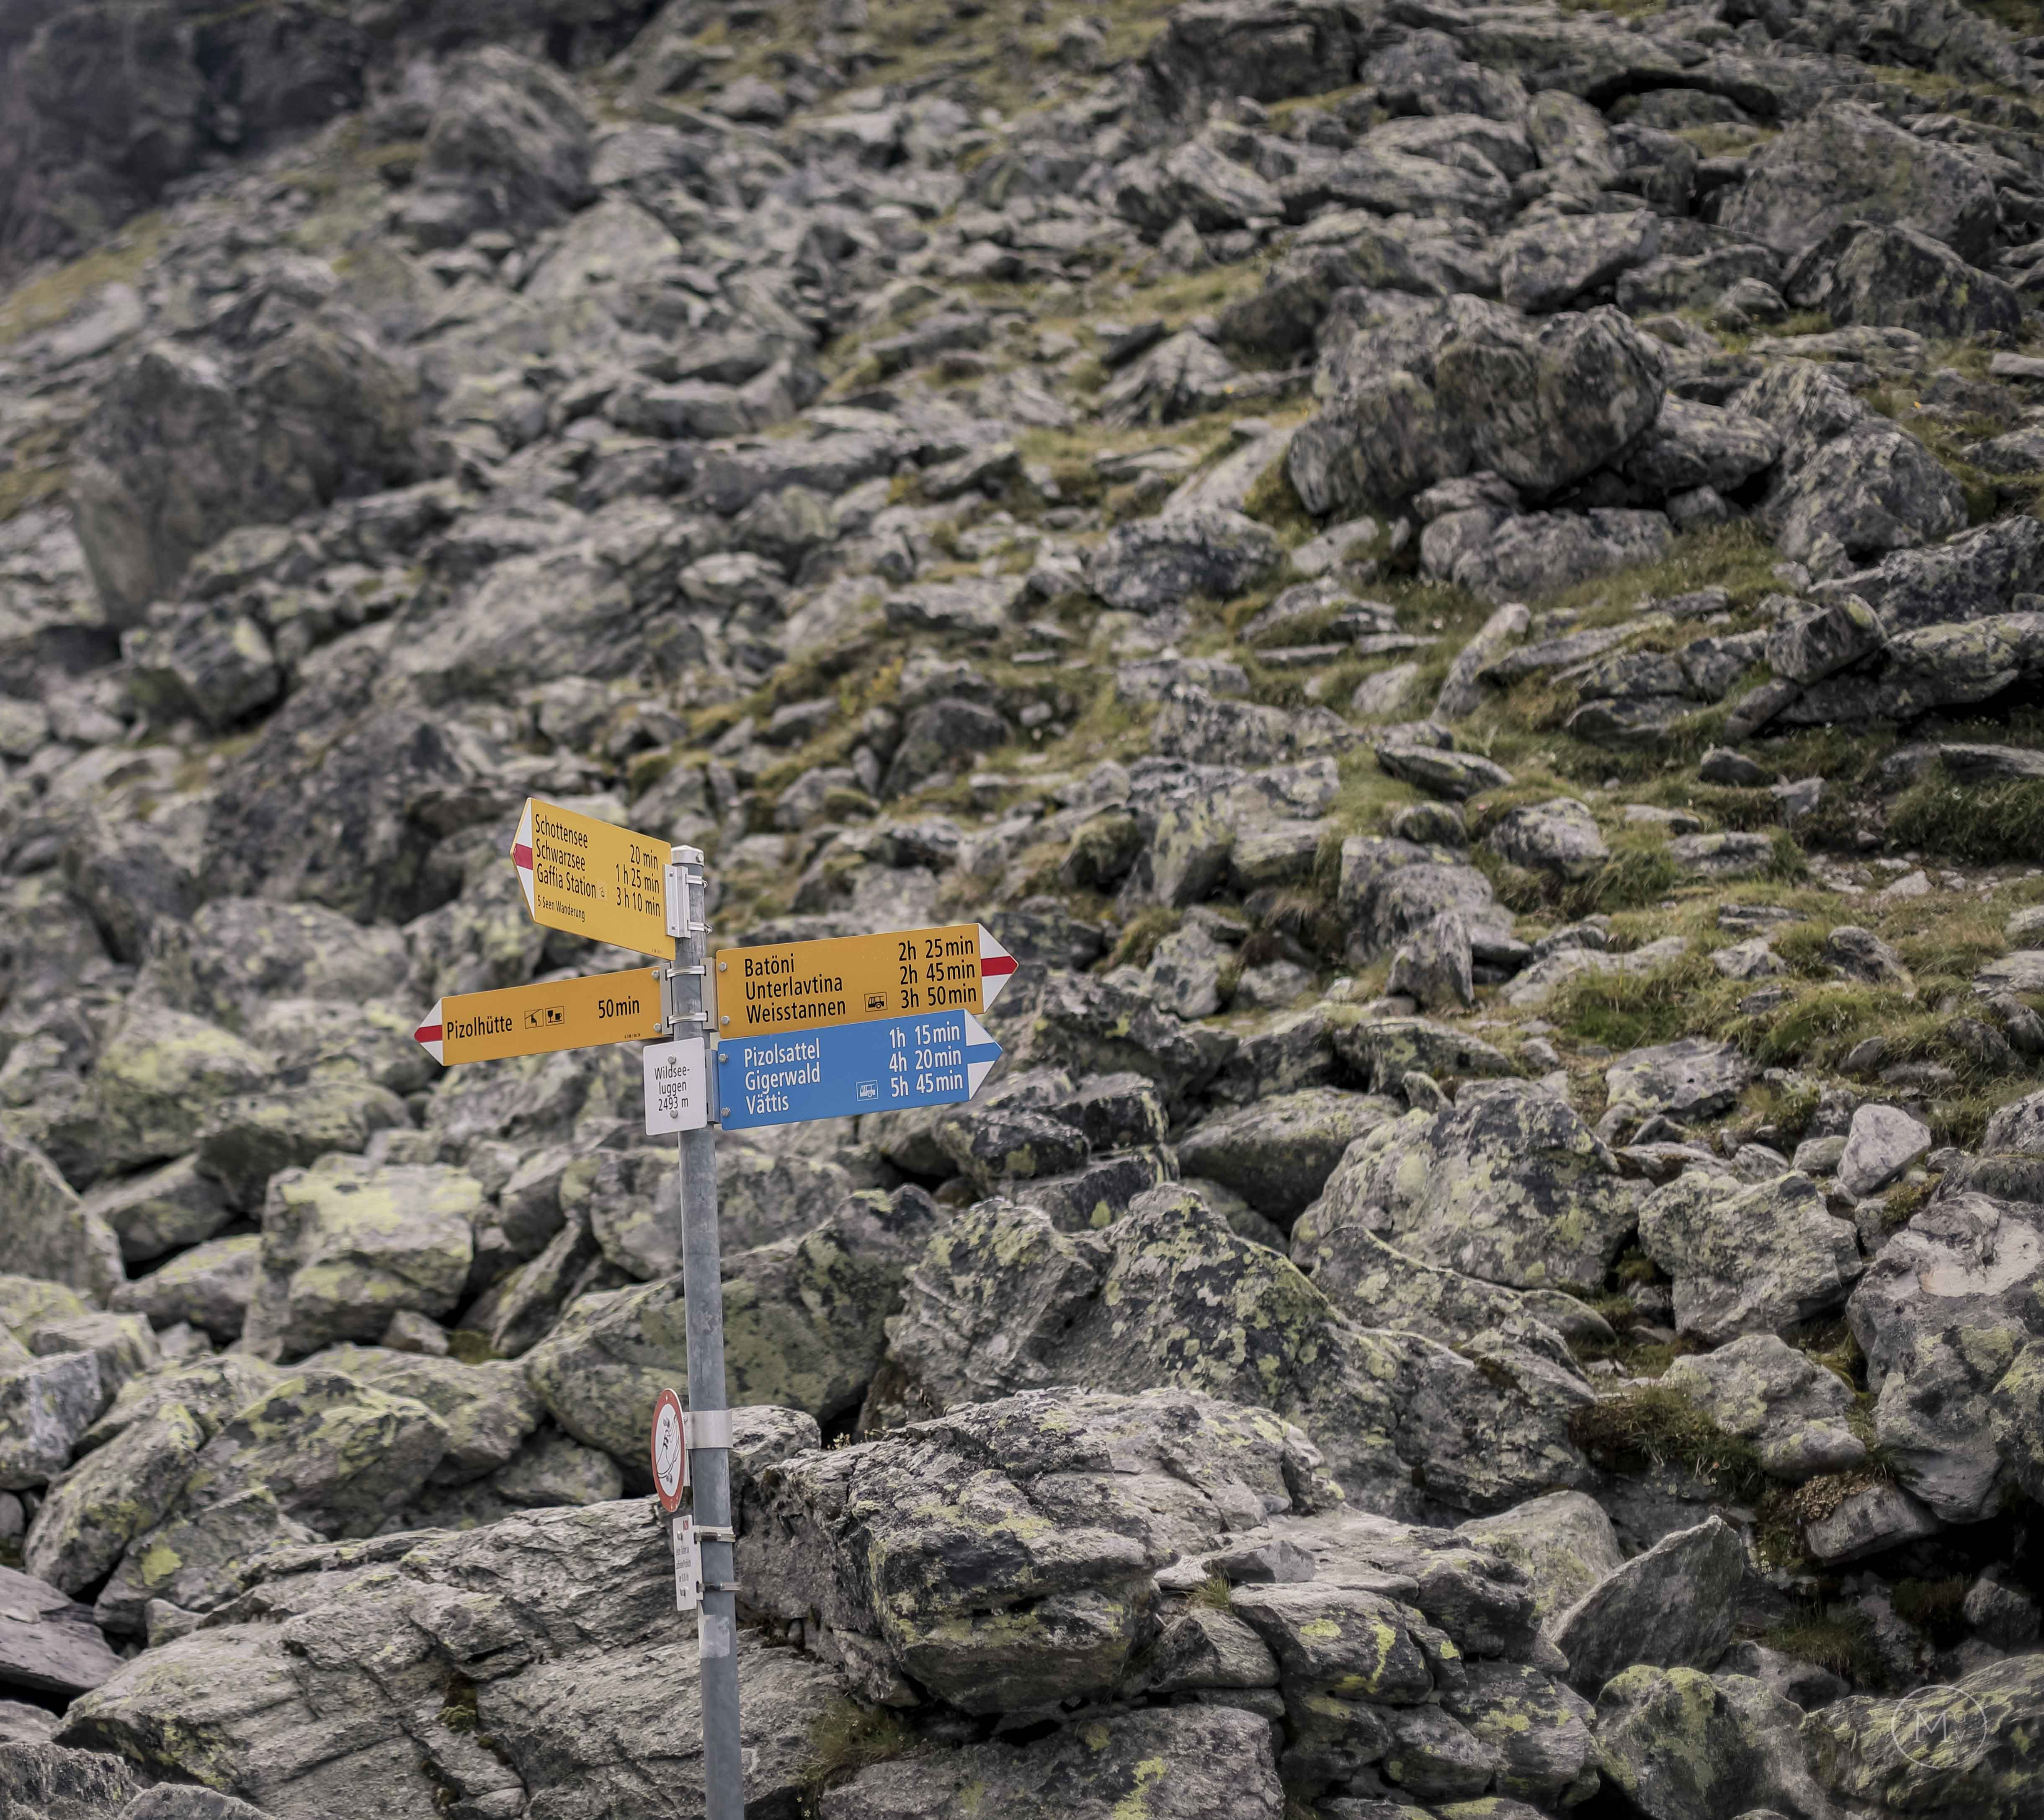 #suisse #switzerland #swiss #travel #voyage #decouverte #discovery #travelphotography #traveldestinations #travelquotes #travelpacking #cervin #montcervin #zermatt #matterhorn #lausanne #weggis #randonnee